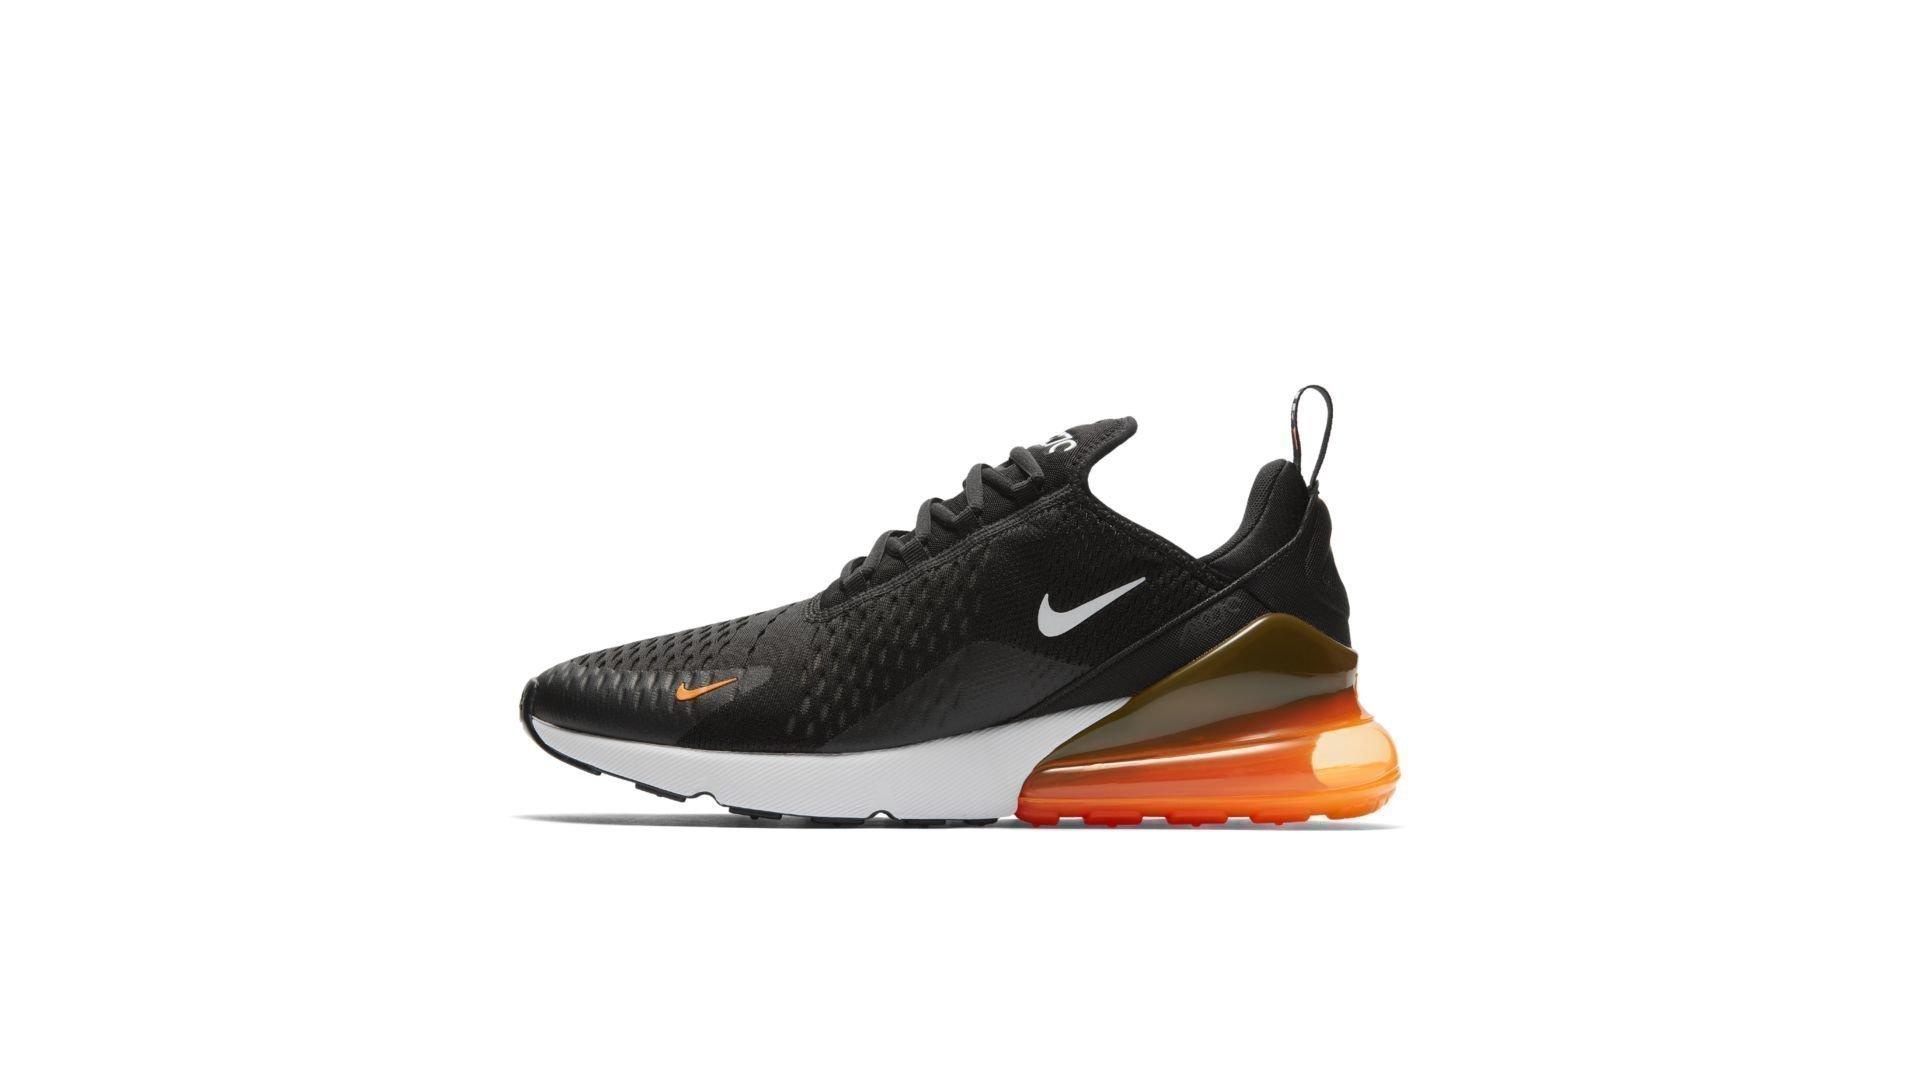 Nike Air Max 270 'Just Do It' Black (AH8050-014)